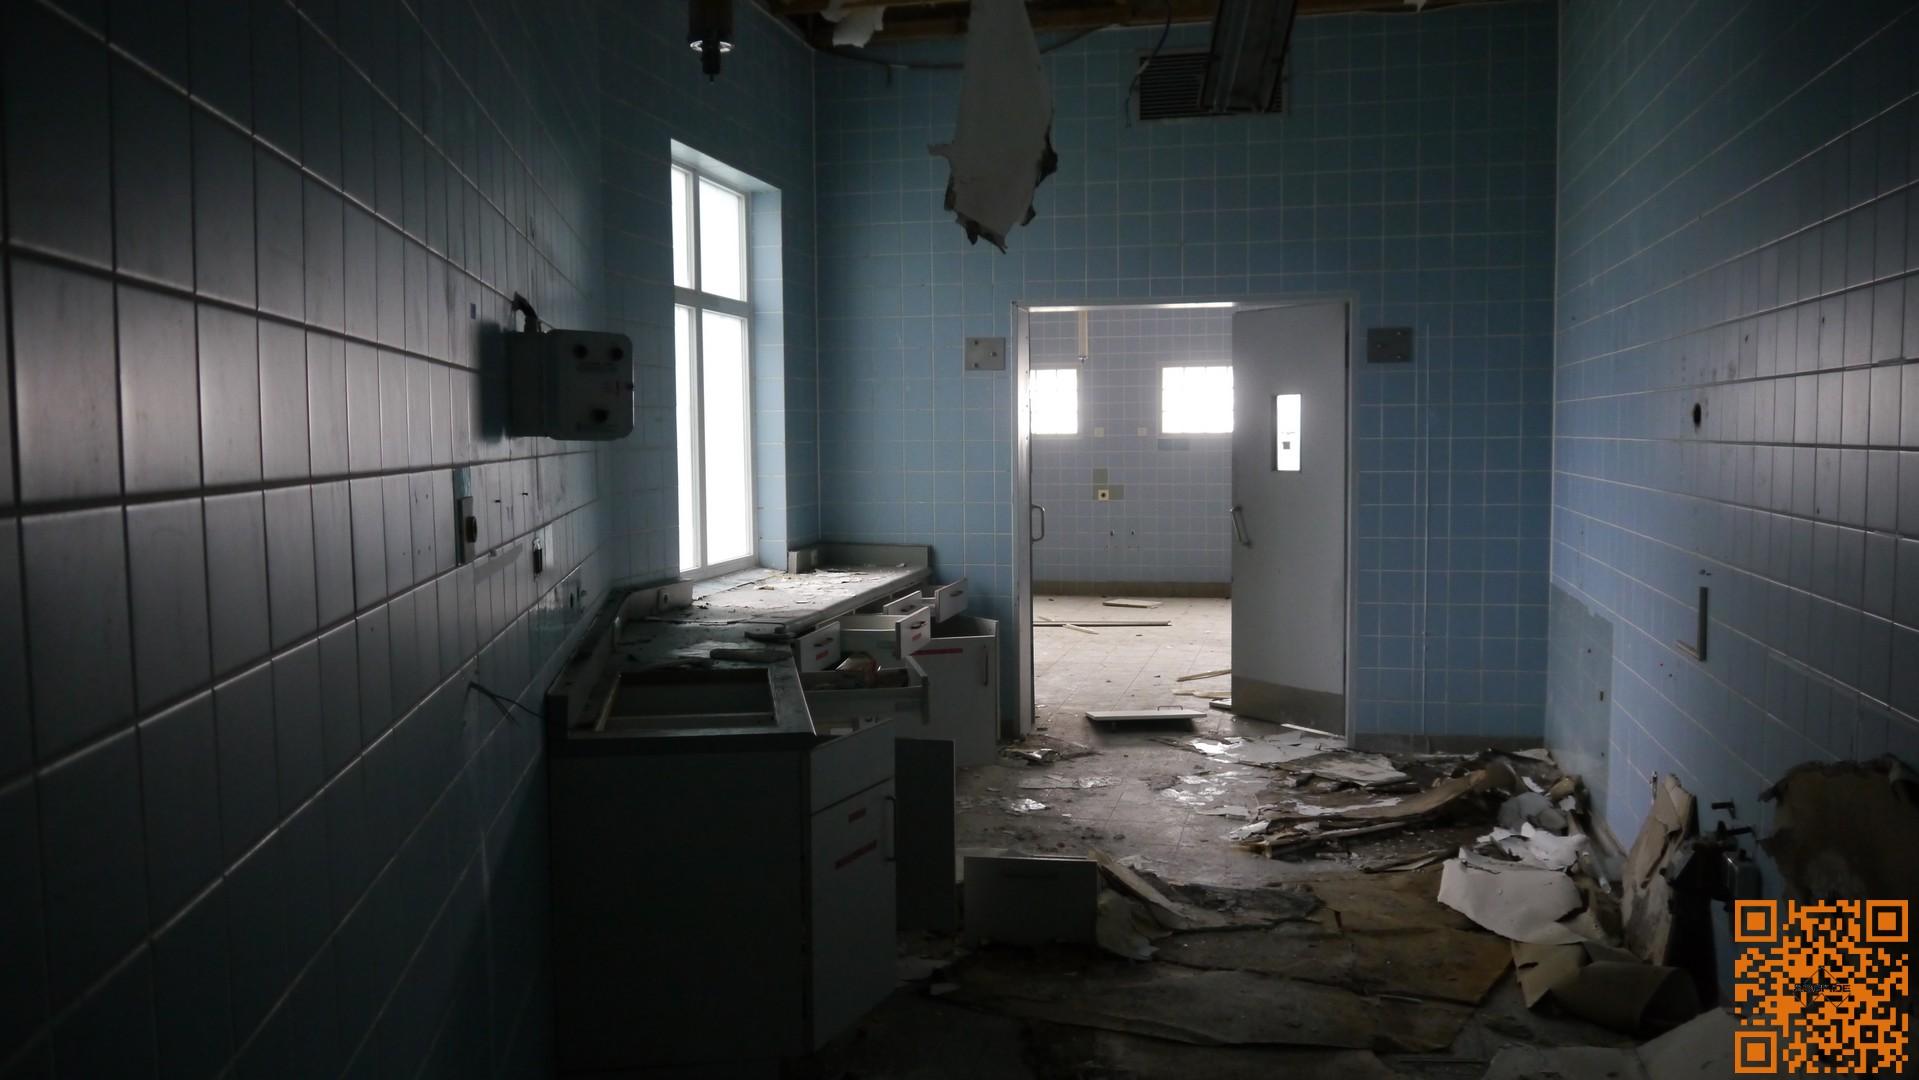 hospital2-17-09-16-13